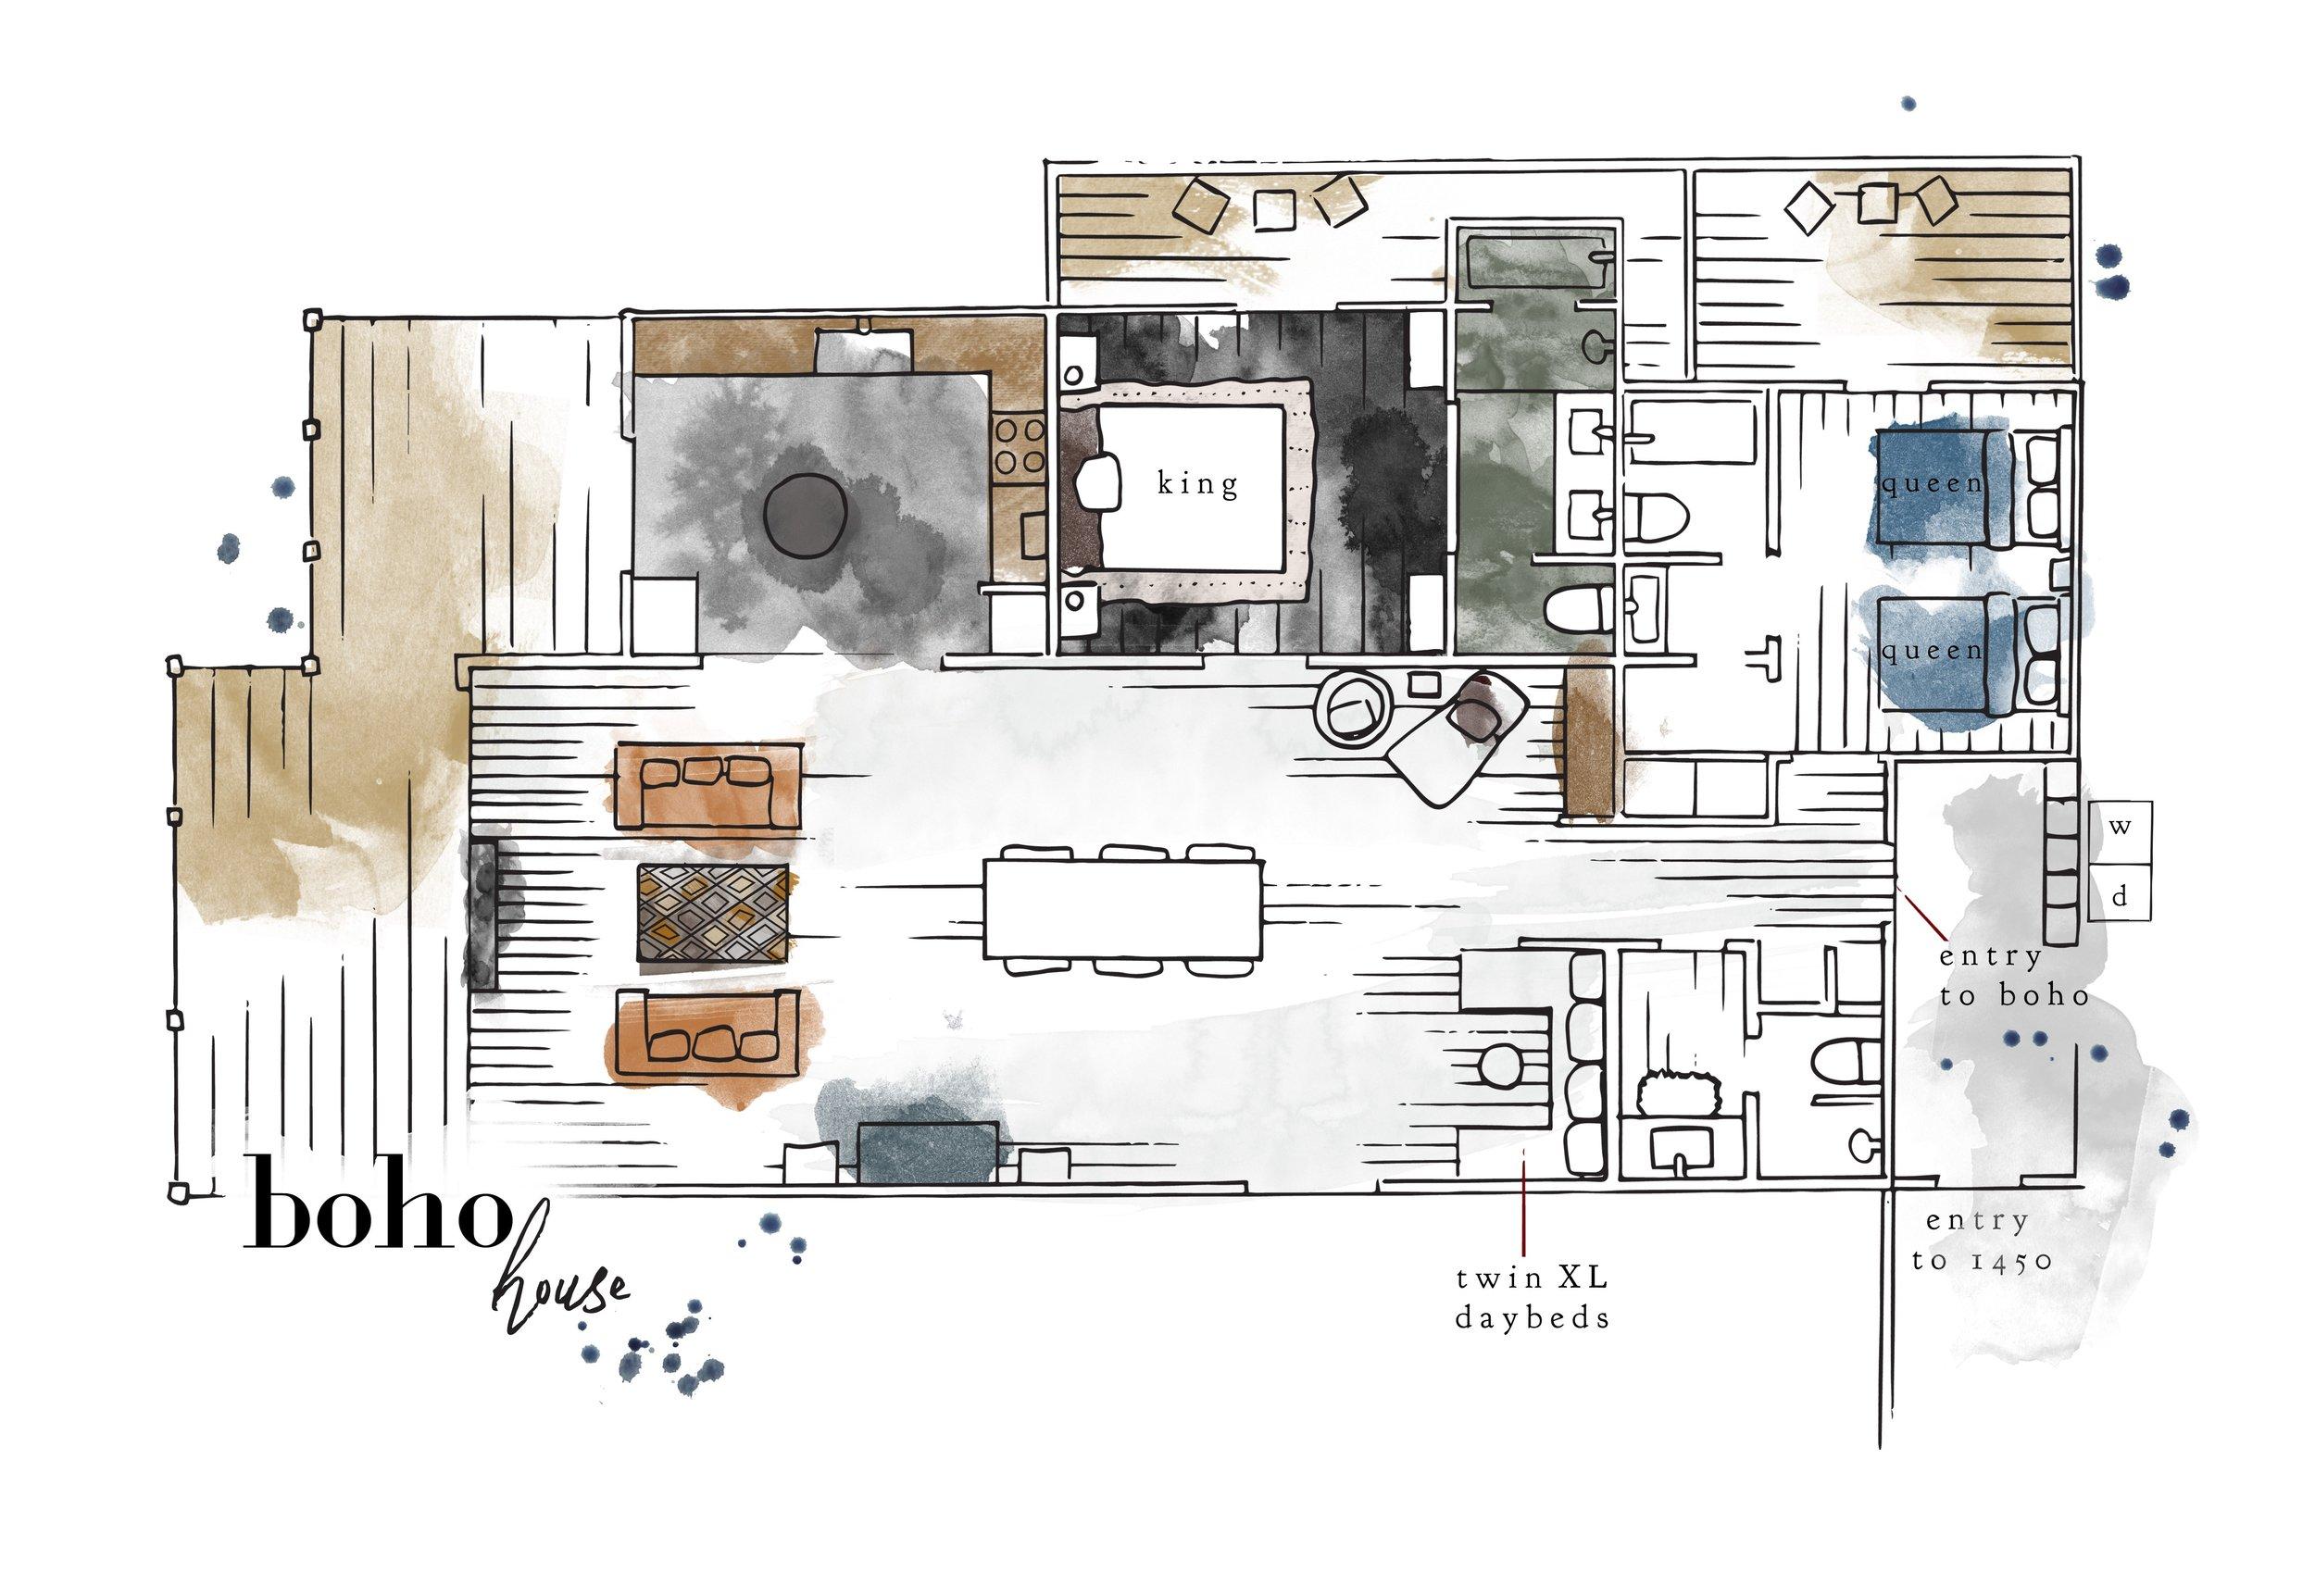 Boho floor plan